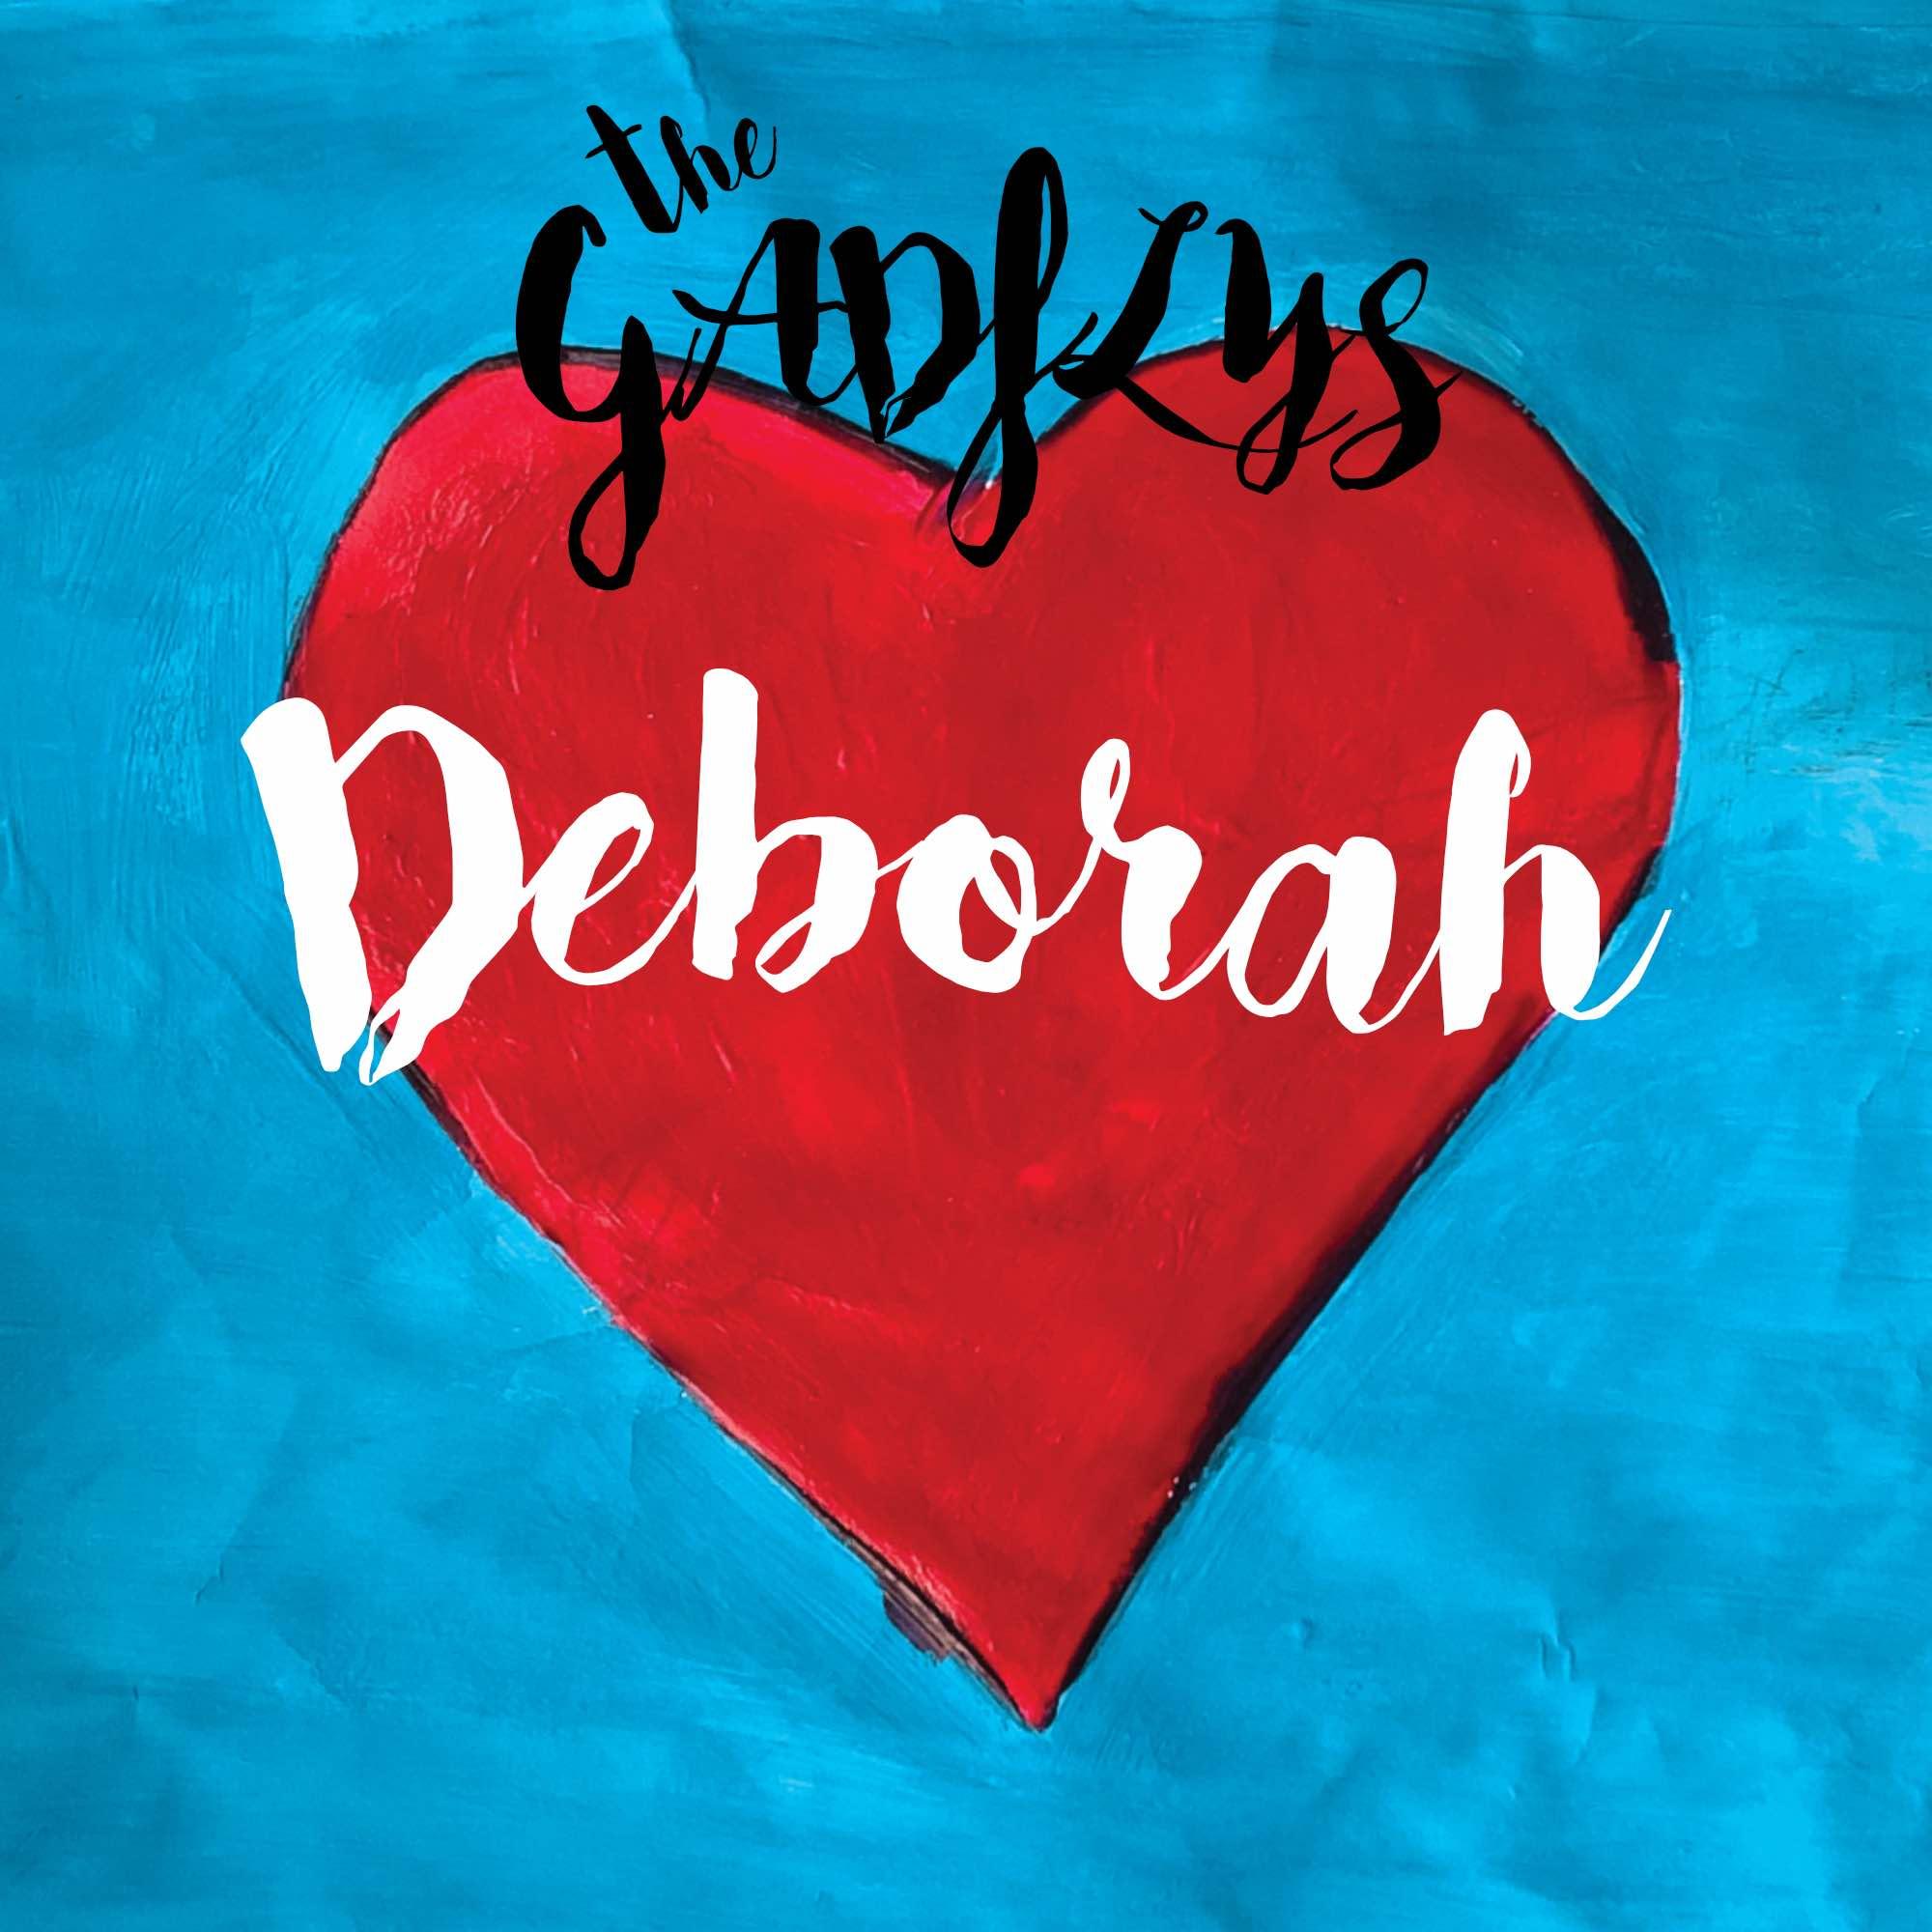 DEBORAH – THE GADFLYS